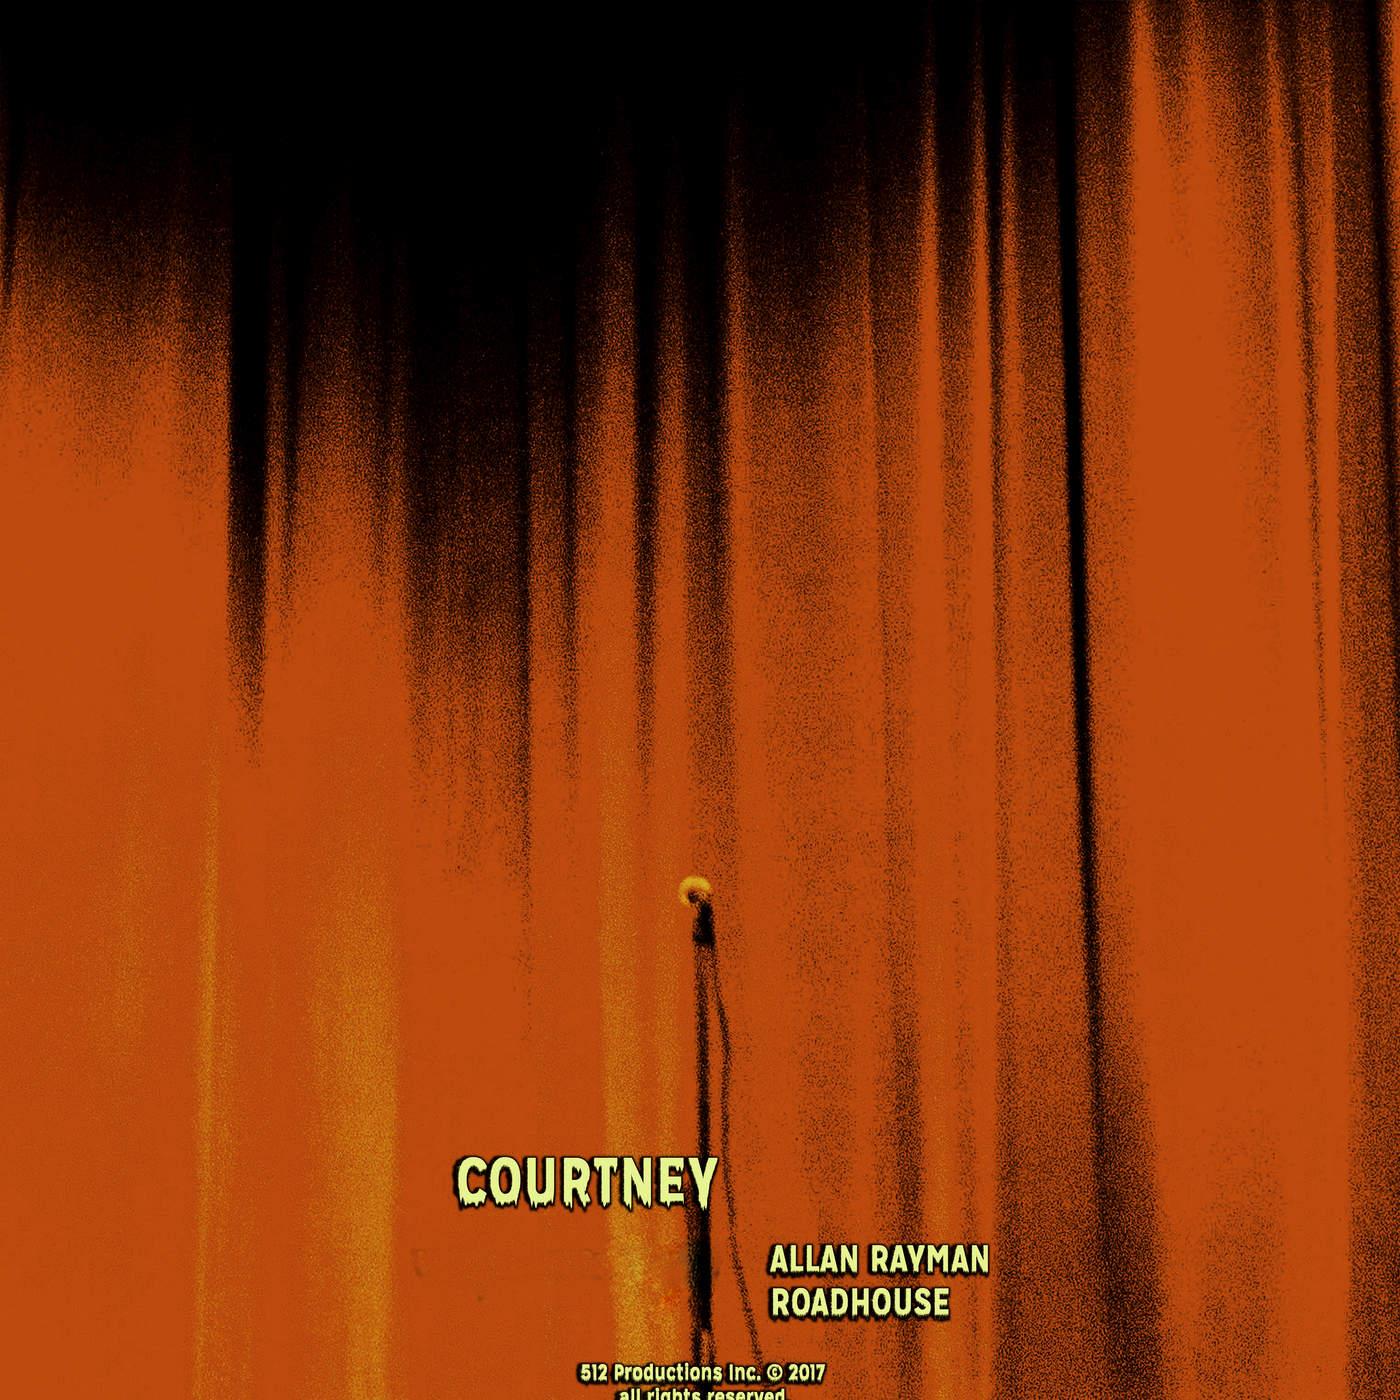 Allan Rayman - Courtney - EP